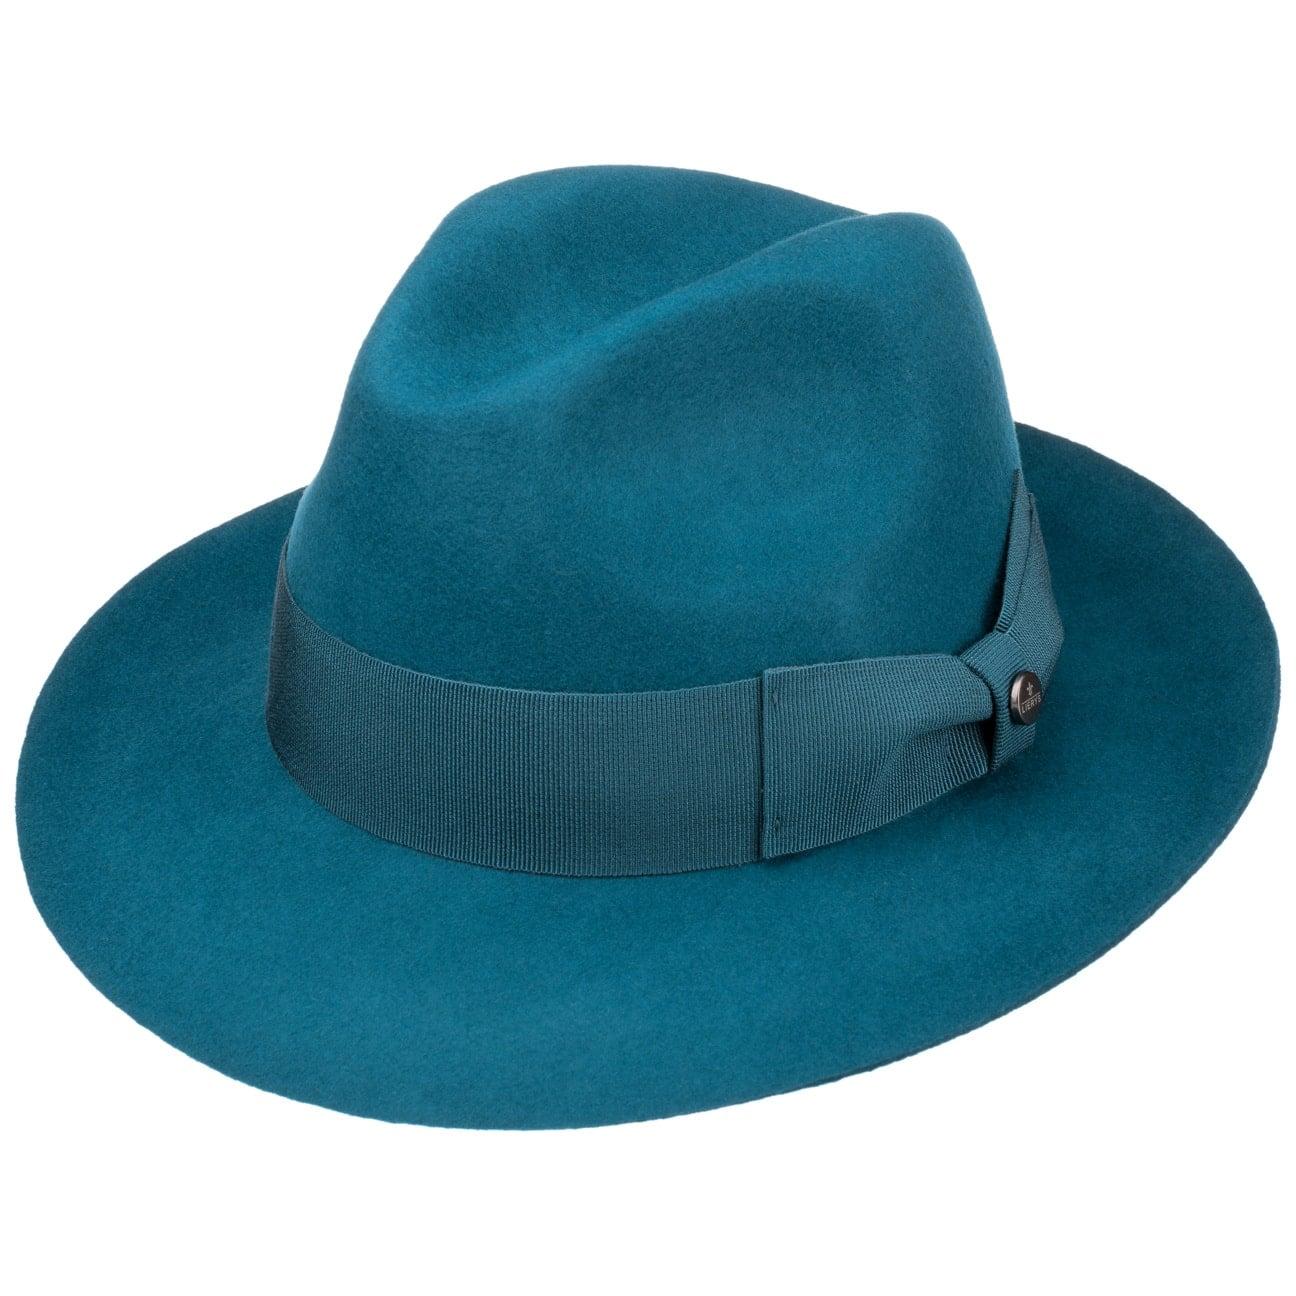 180 s fedora by lierys gbp 54 95 gt hats caps